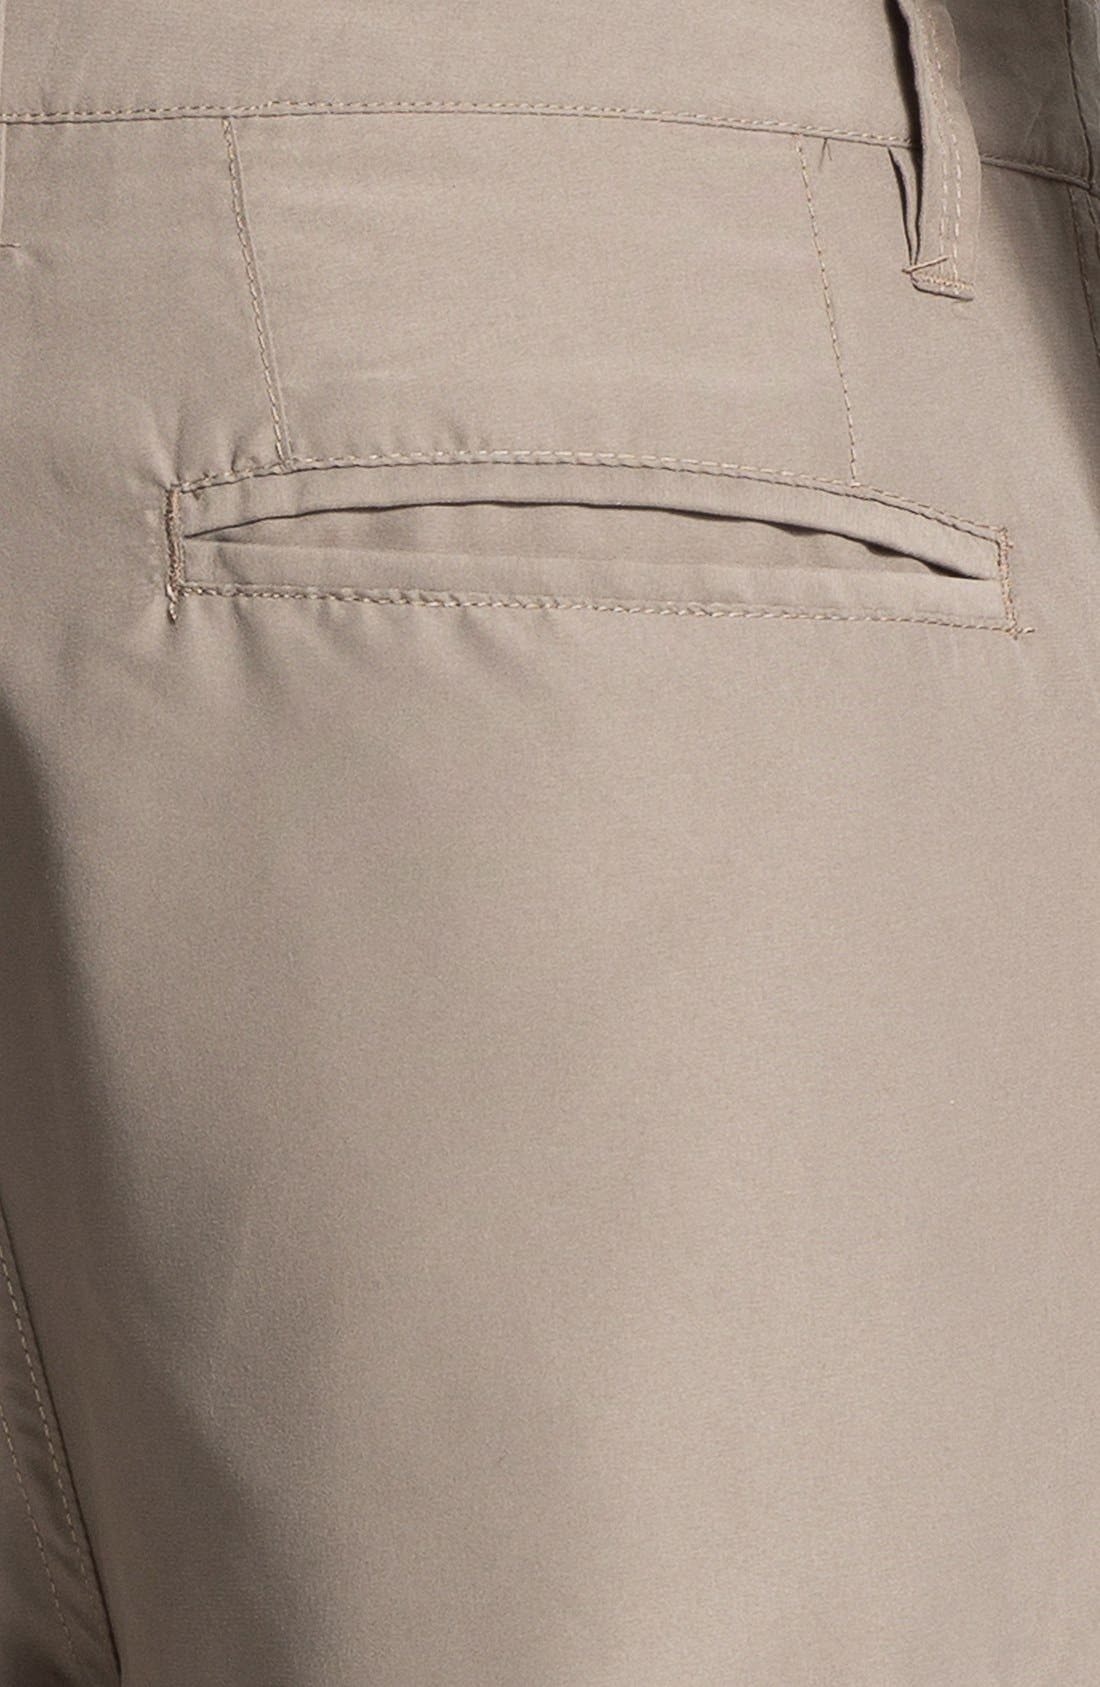 'Huntington Beach' Board Shorts,                             Alternate thumbnail 8, color,